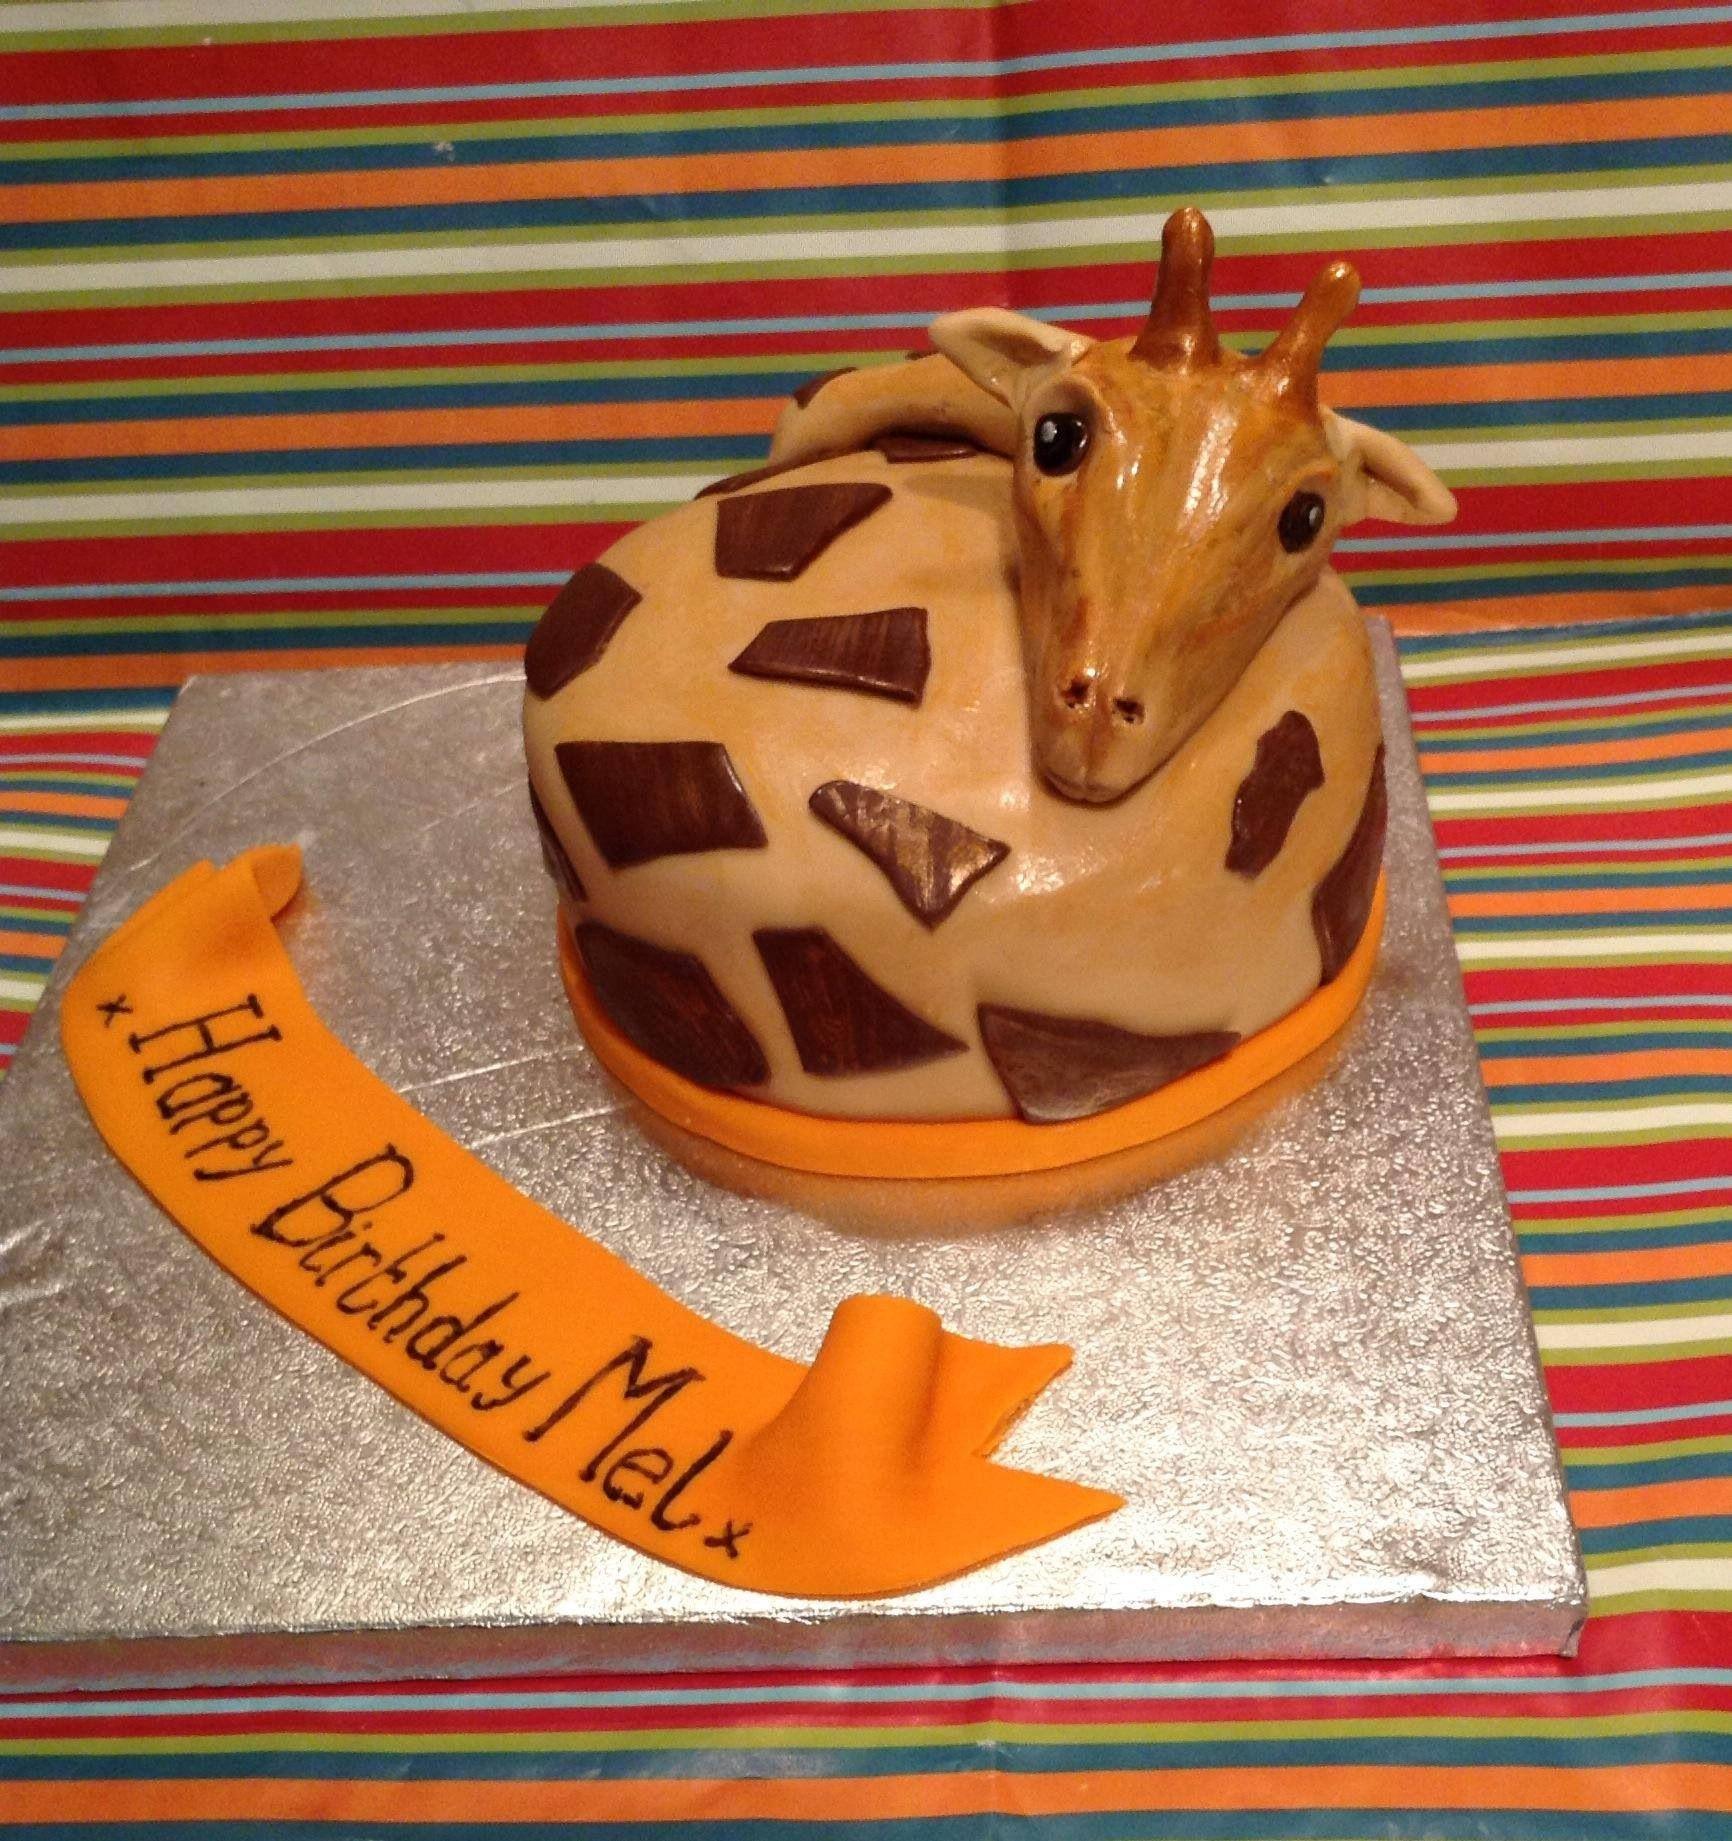 Another giraffe cake